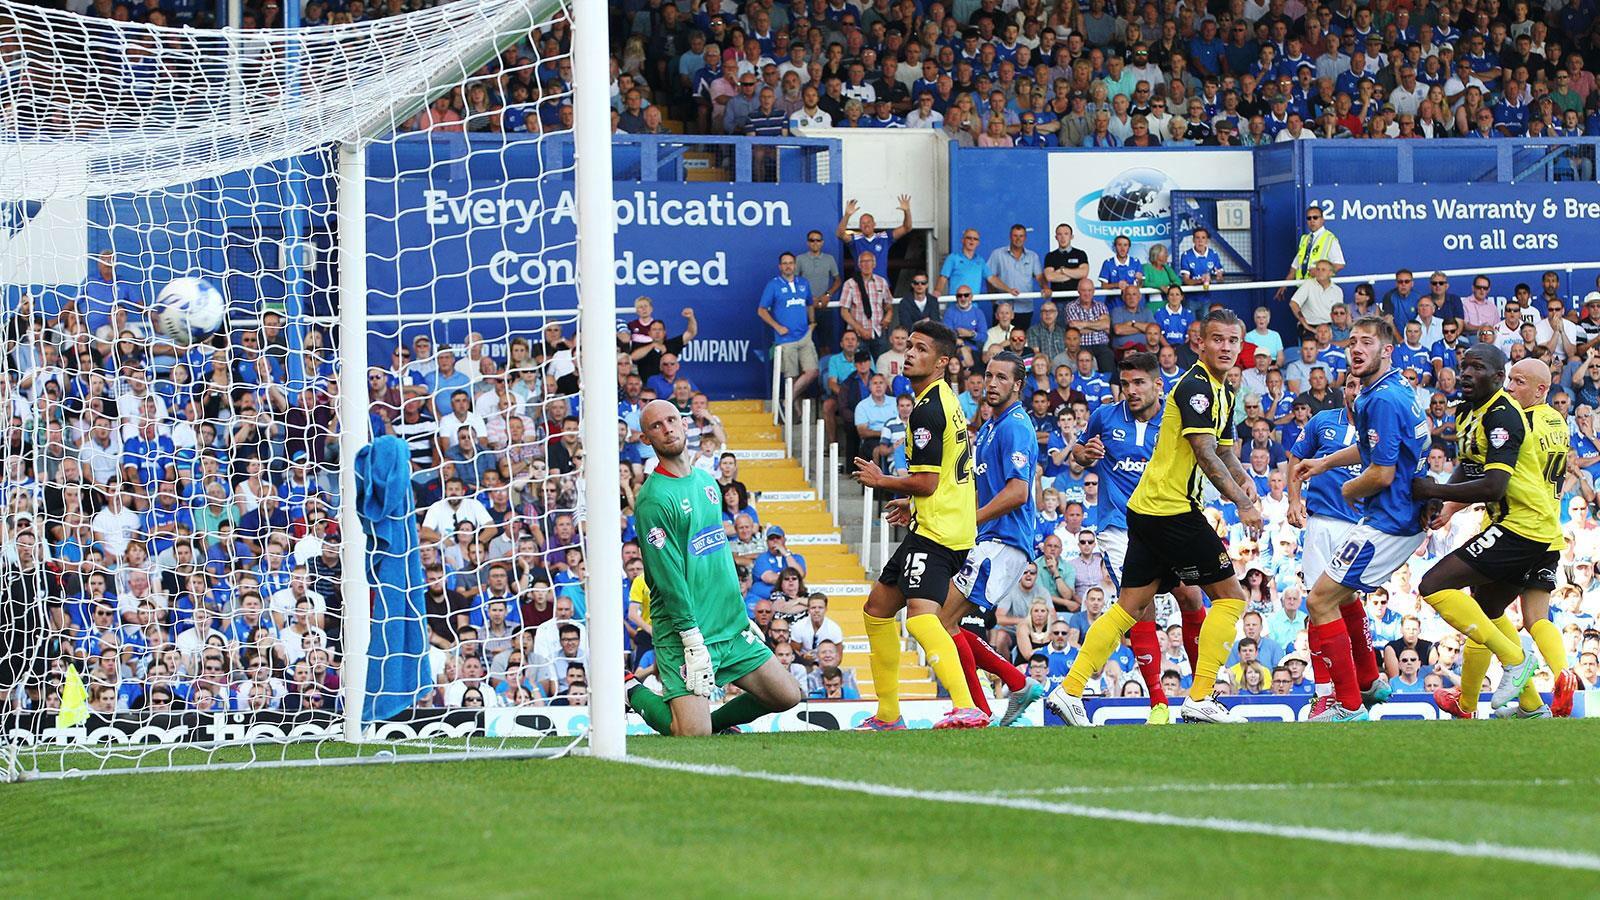 It's a Goal. Pompey 3-0 Win against dagenham and Redbridge at fratton park season 2015-16